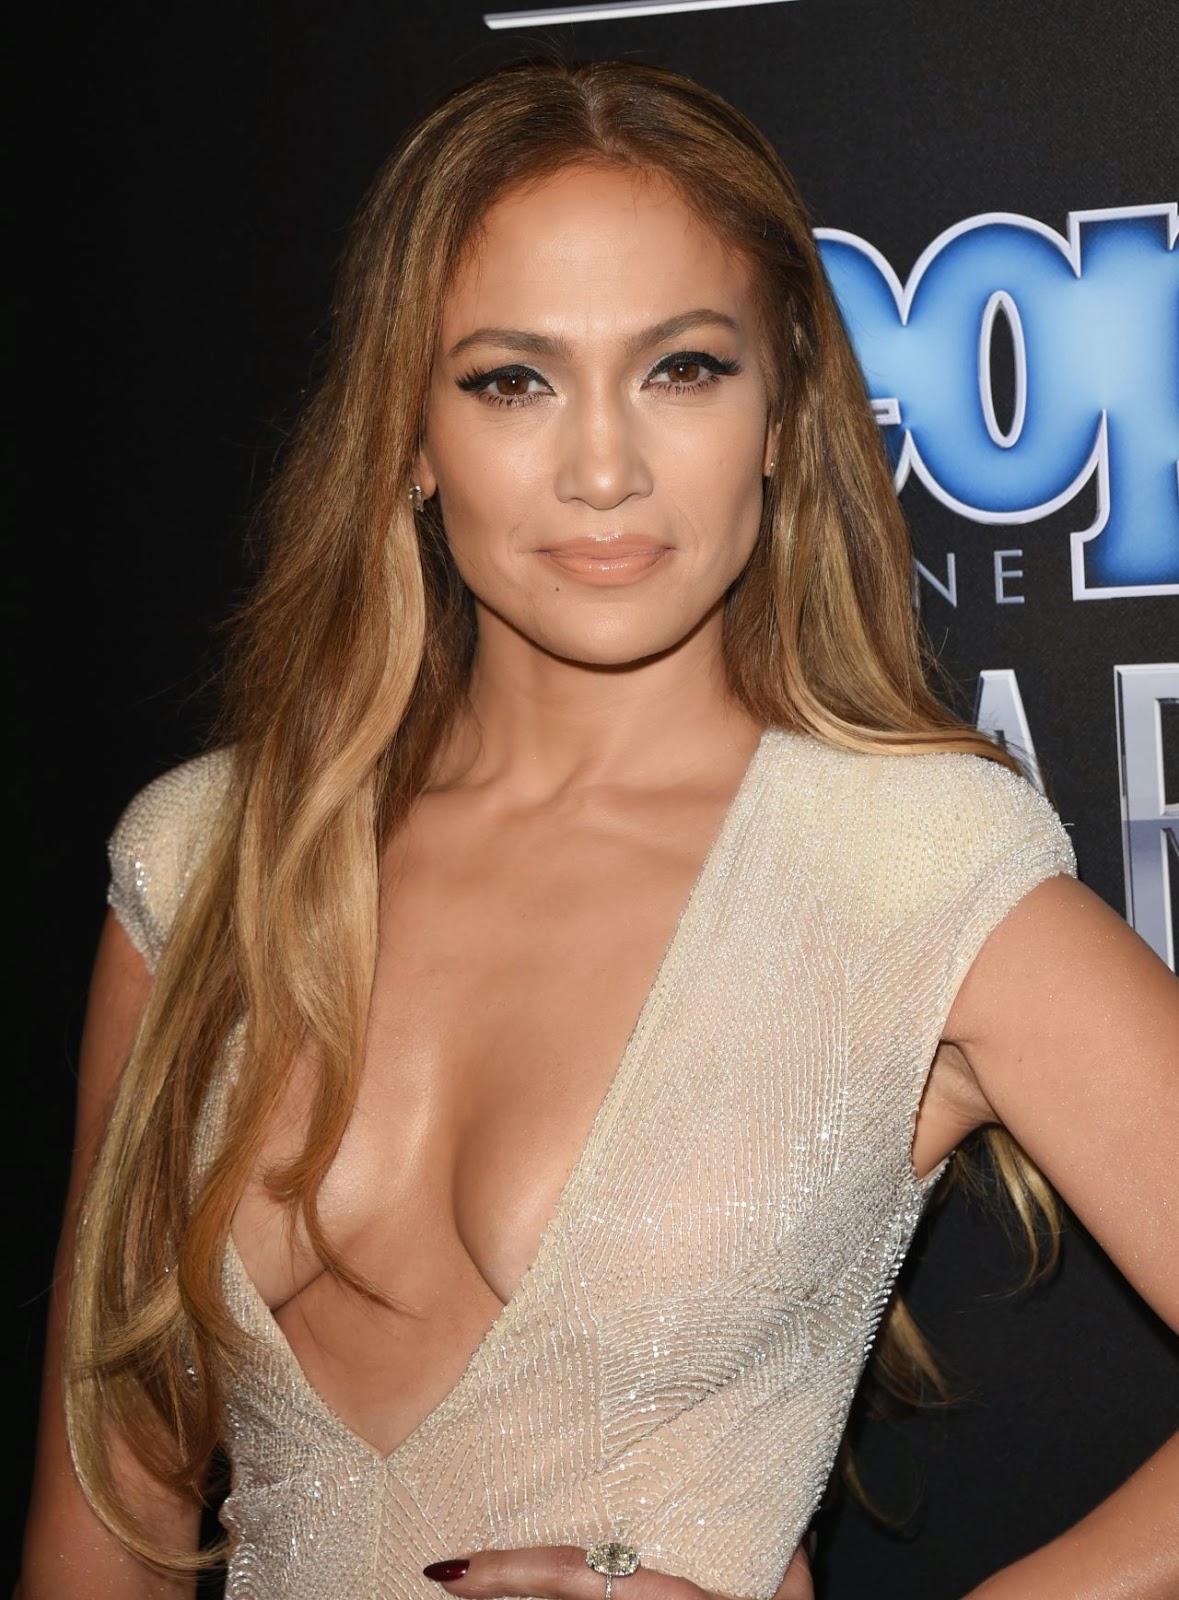 Jennifer Lopez Flaunts Major Cleavage at People Magazine